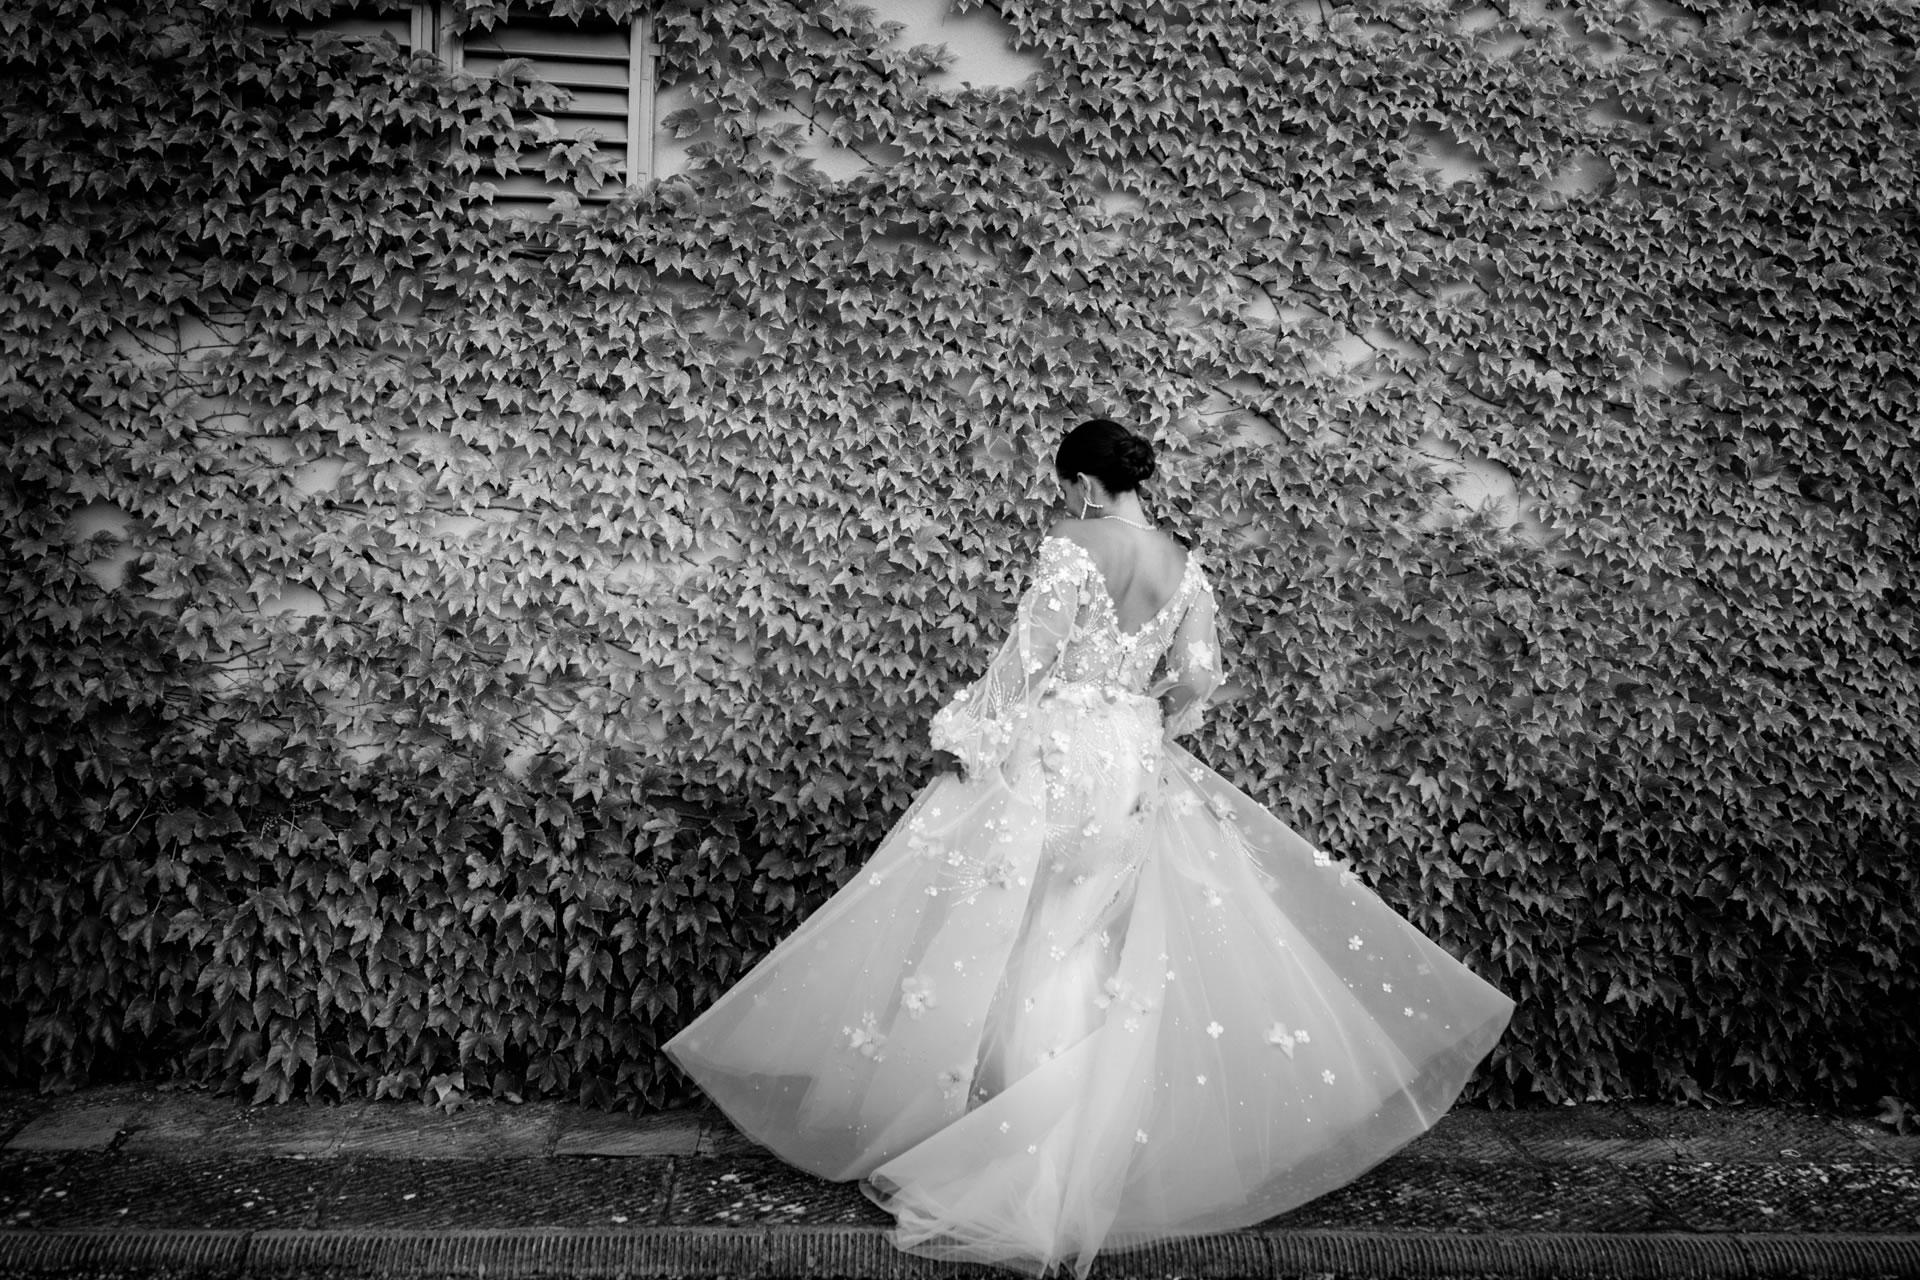 Luxury - 32 :: Luxury wedding at Il Borro :: Luxury wedding photography - 31 :: Luxury - 32